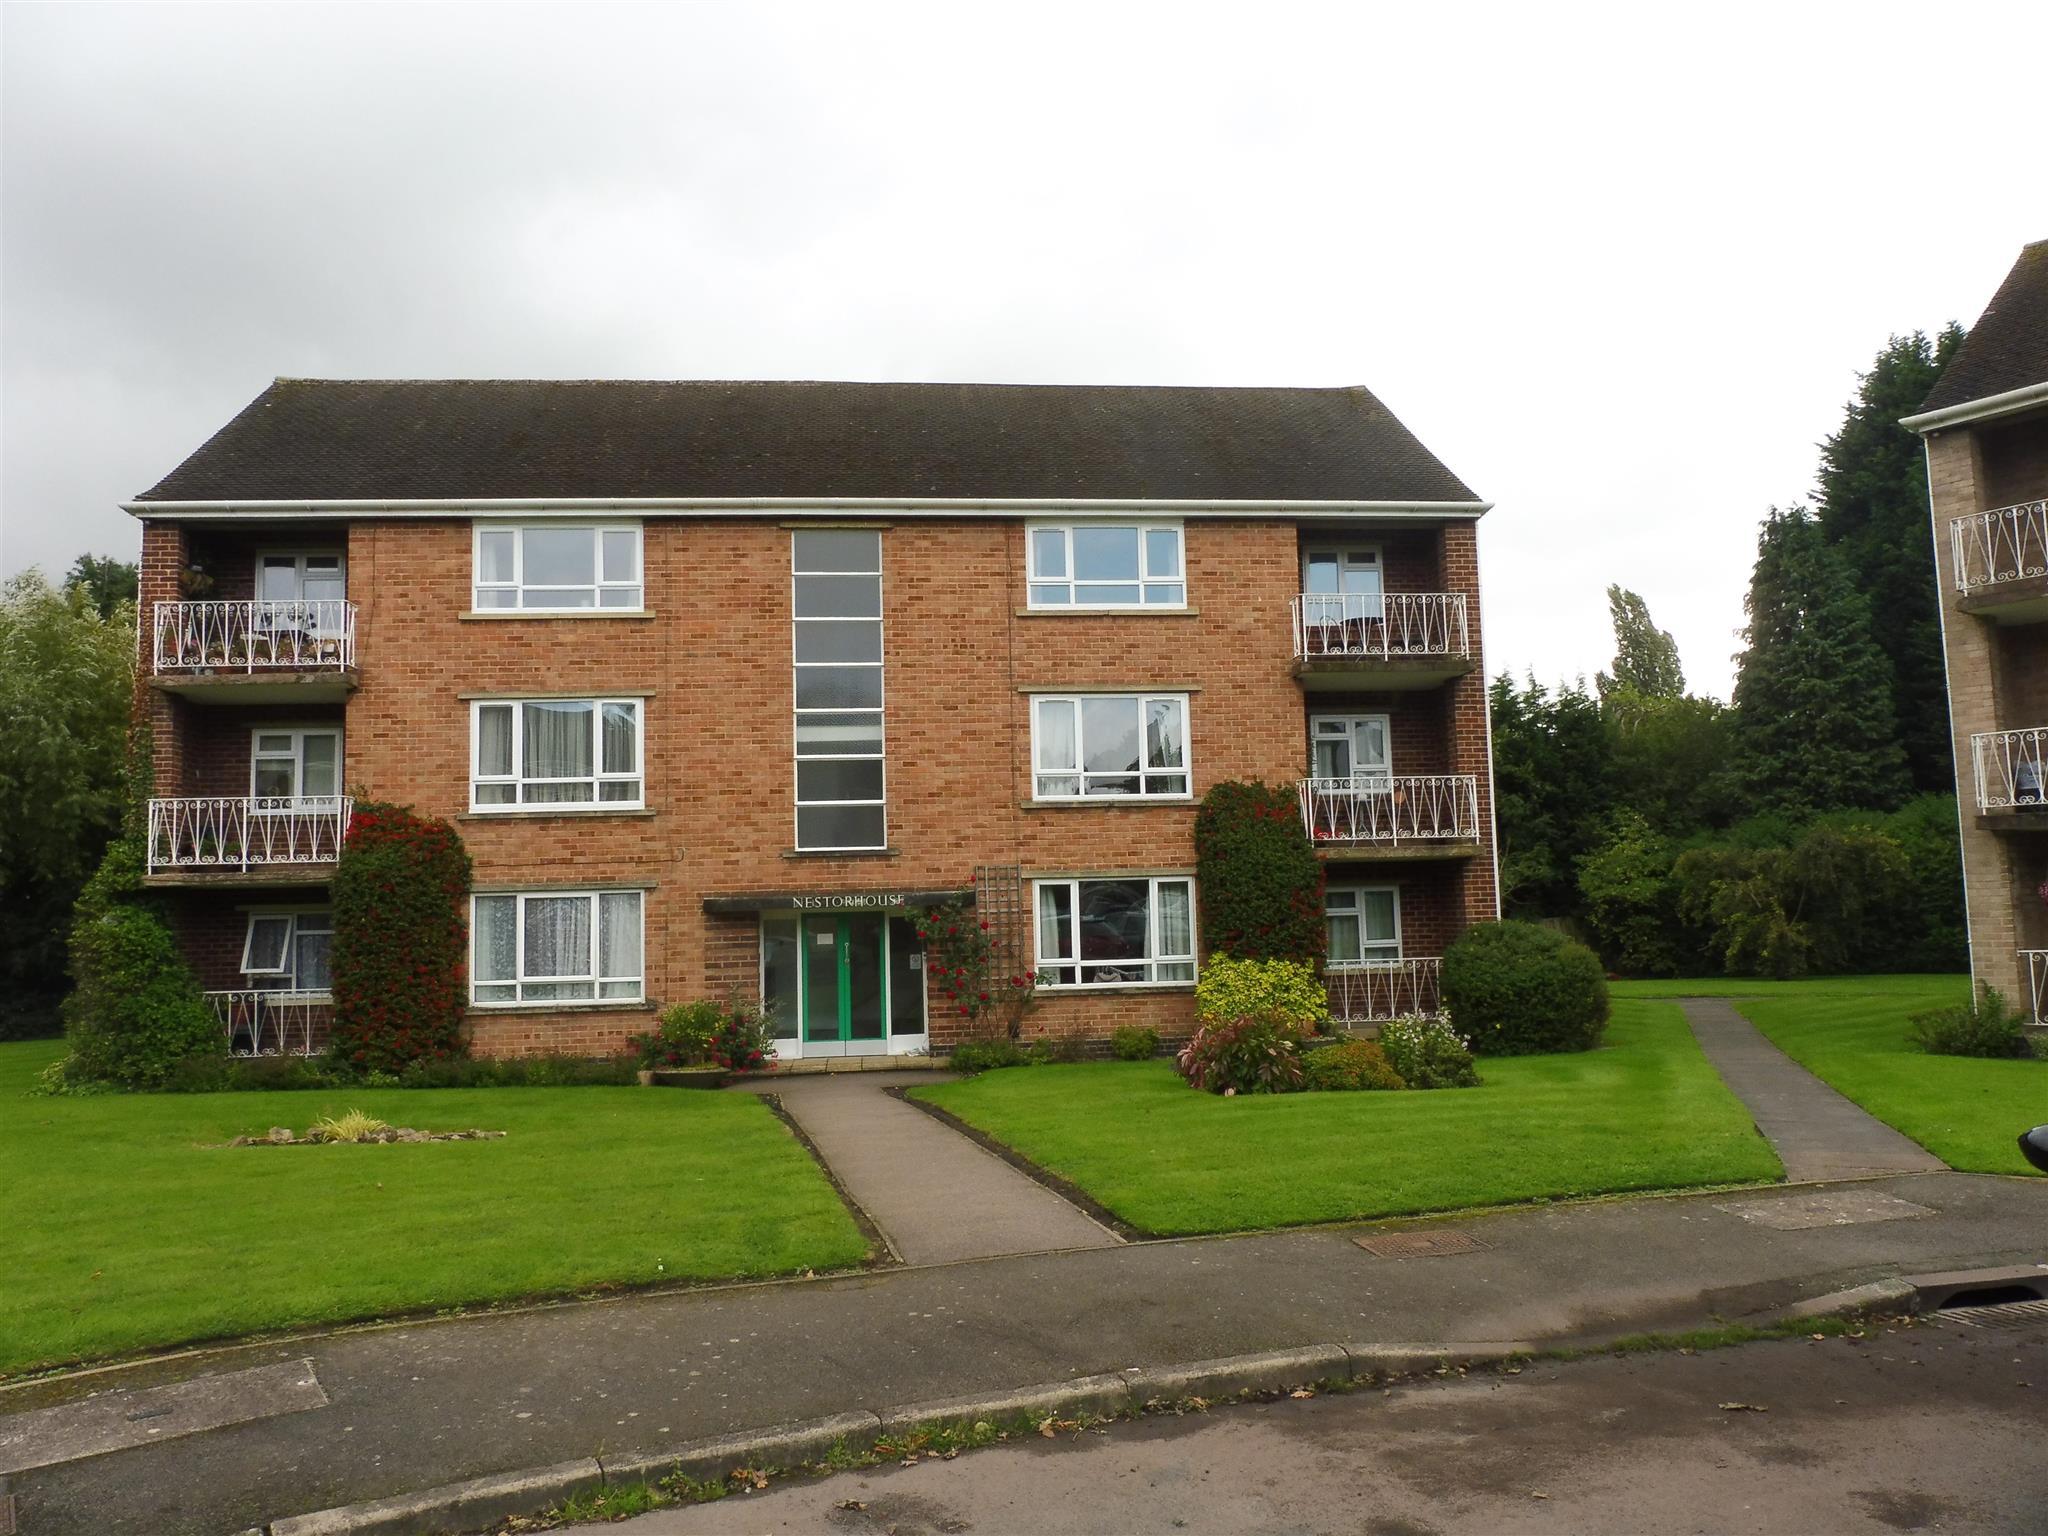 2 Bedroom Flat To Rent Angelo House Charlecott Close Birmingham B13 0de